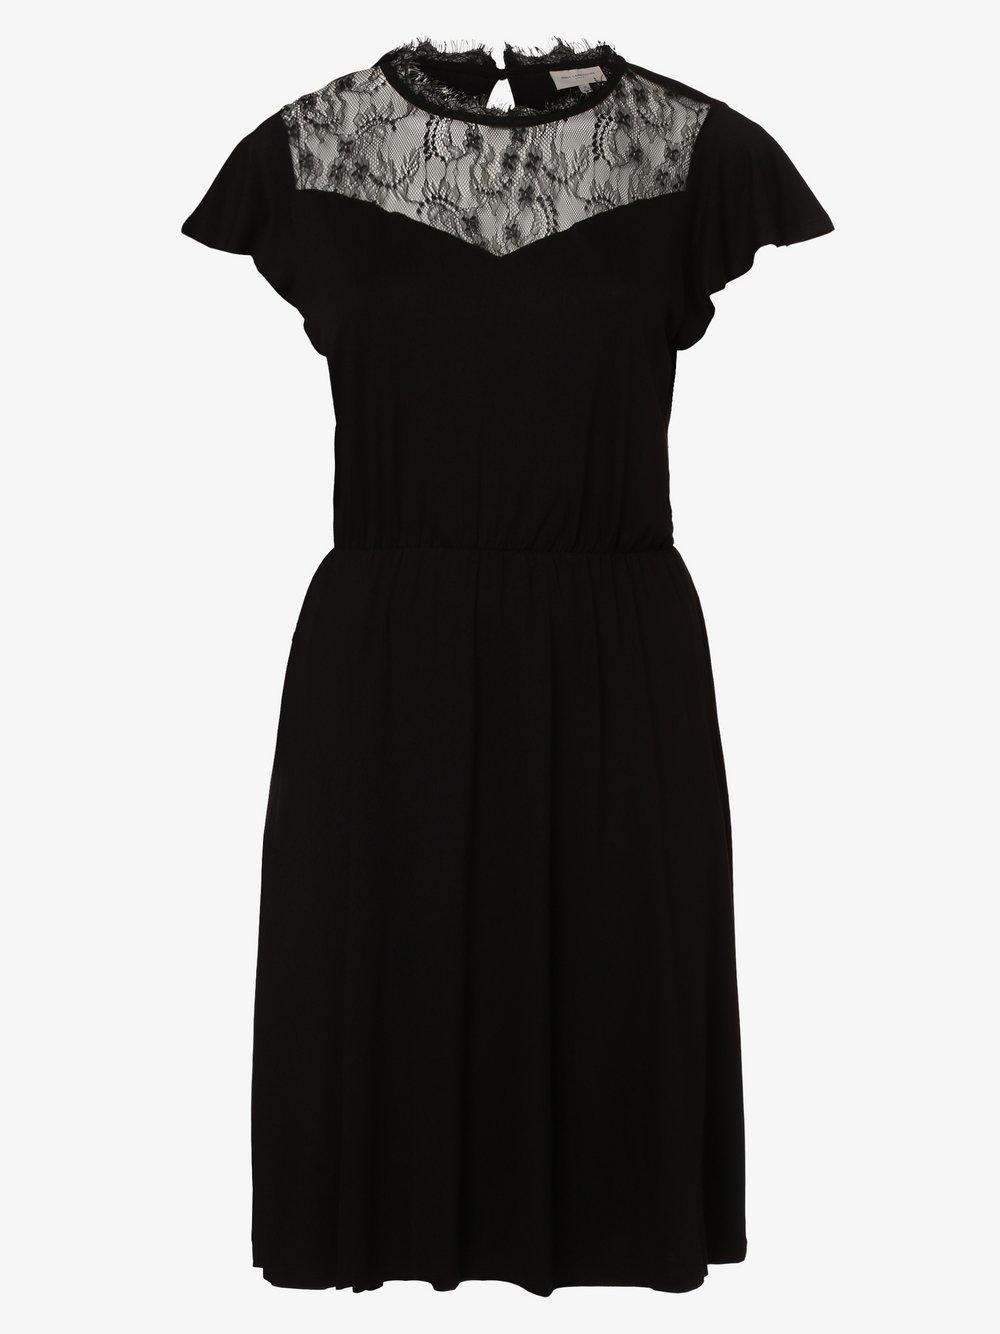 ONLY Carmakoma – Sukienka damska – Carflavor, czarny Van Graaf 470561-0001-04648